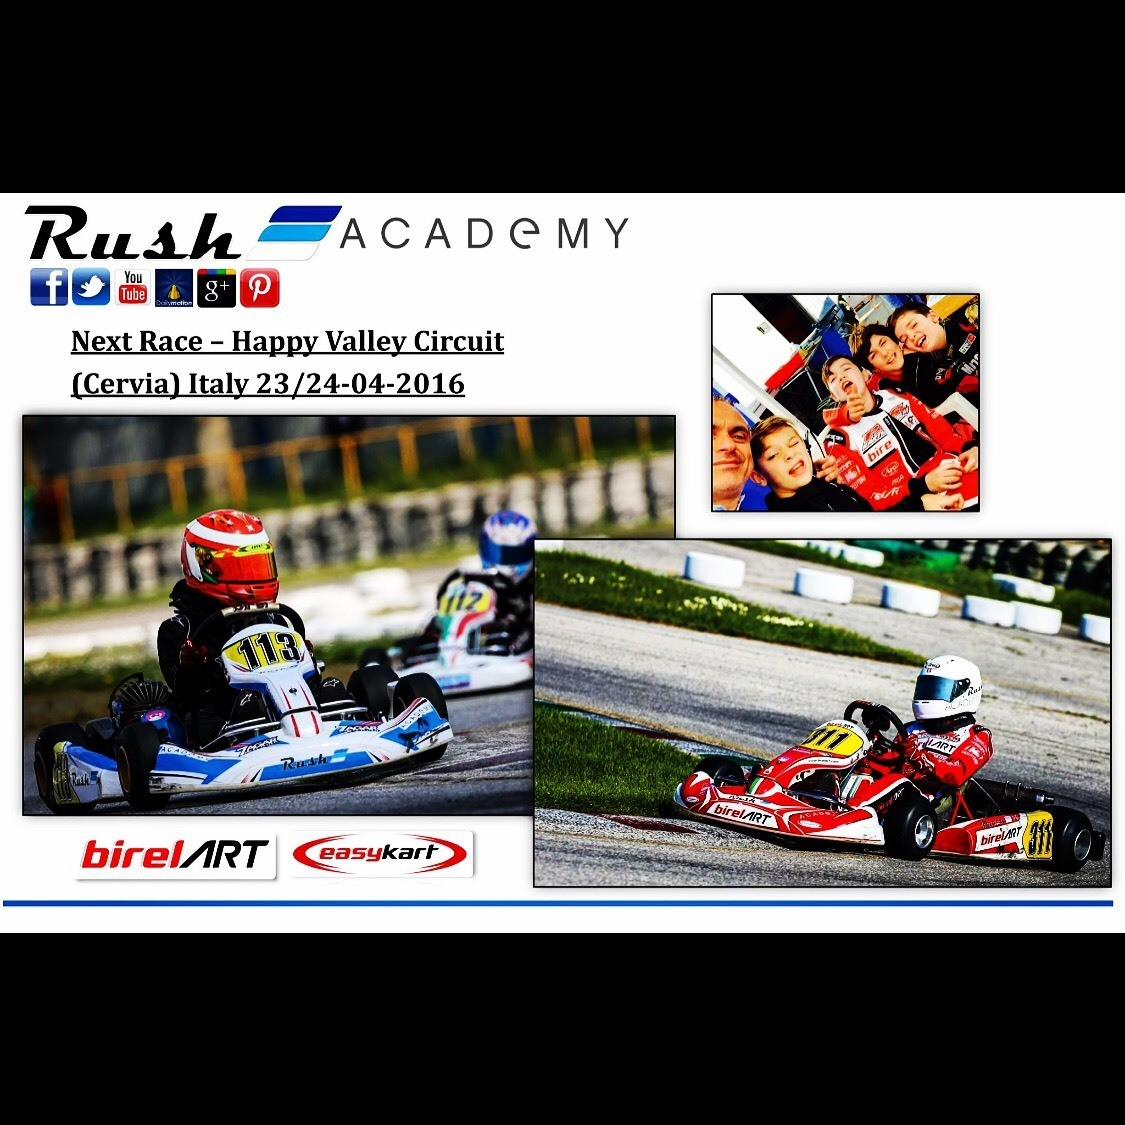 NEXT RACE - HAPPY VALLEY CIRCUIT (CERVIA) ITALY - 23/24-04-2016